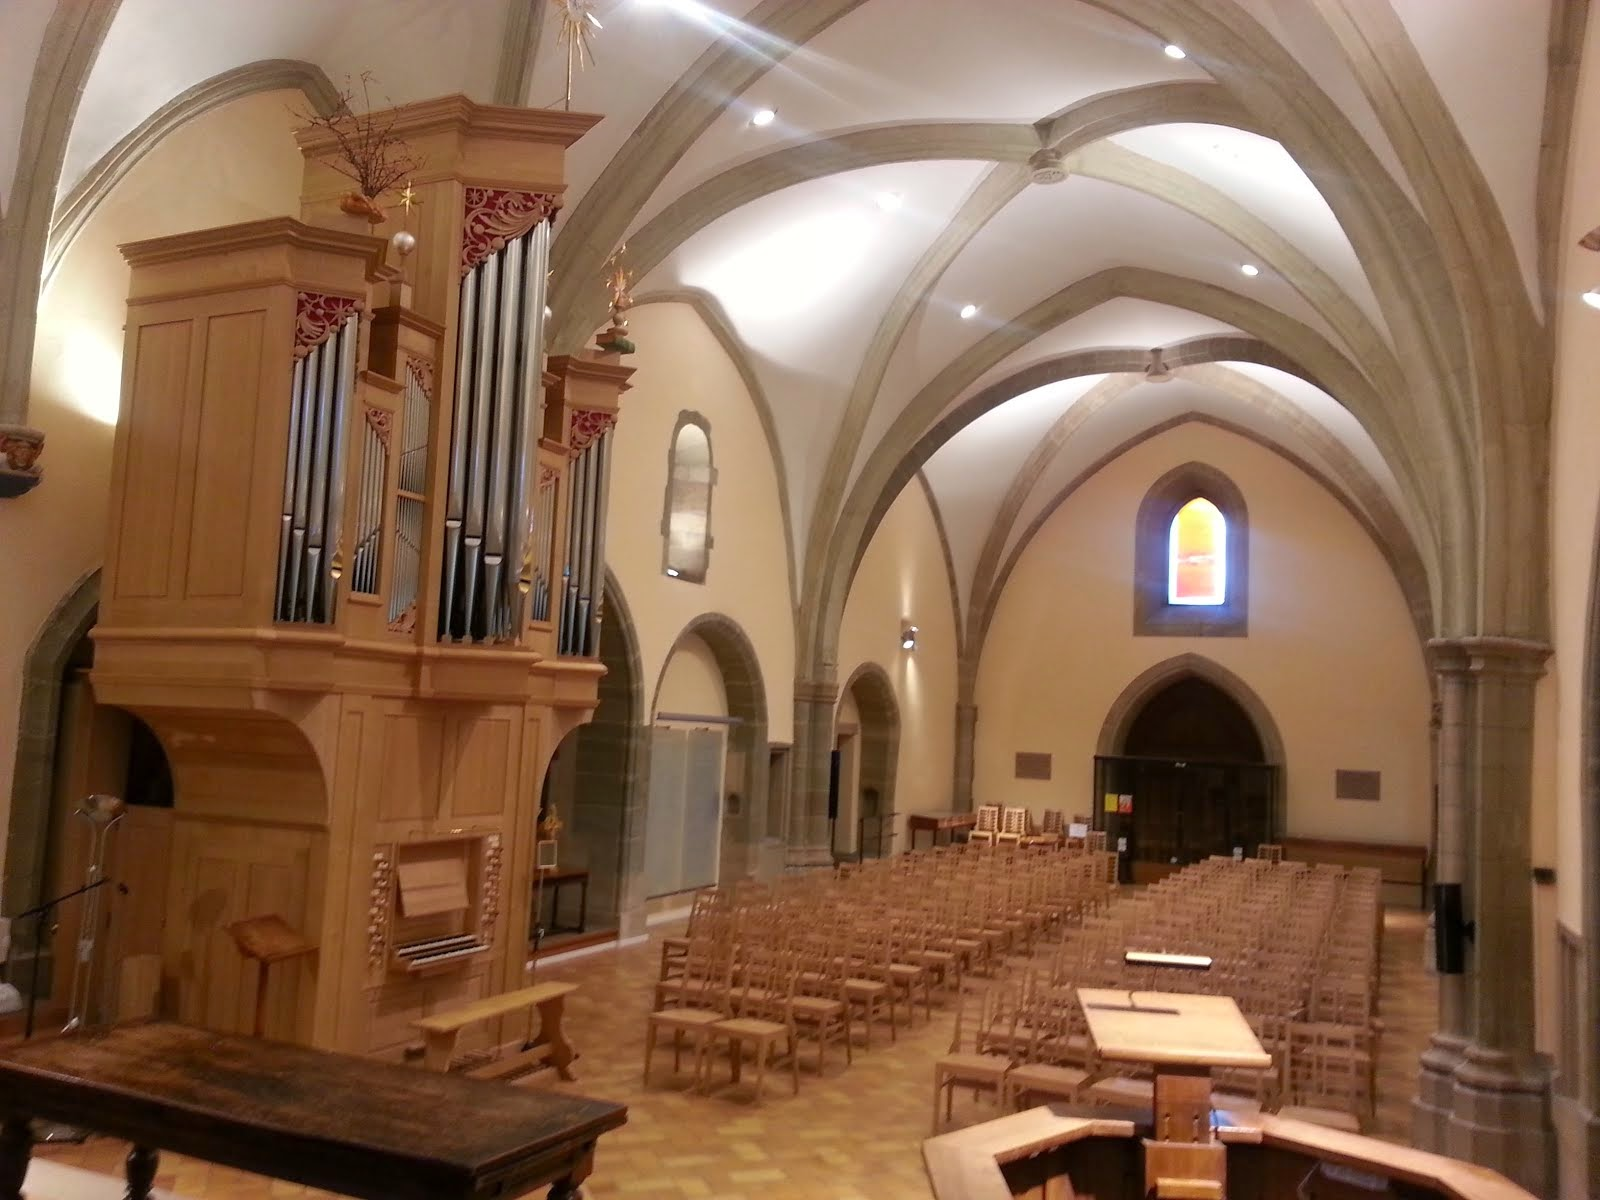 Auditoire de Calvin con nuovo organo